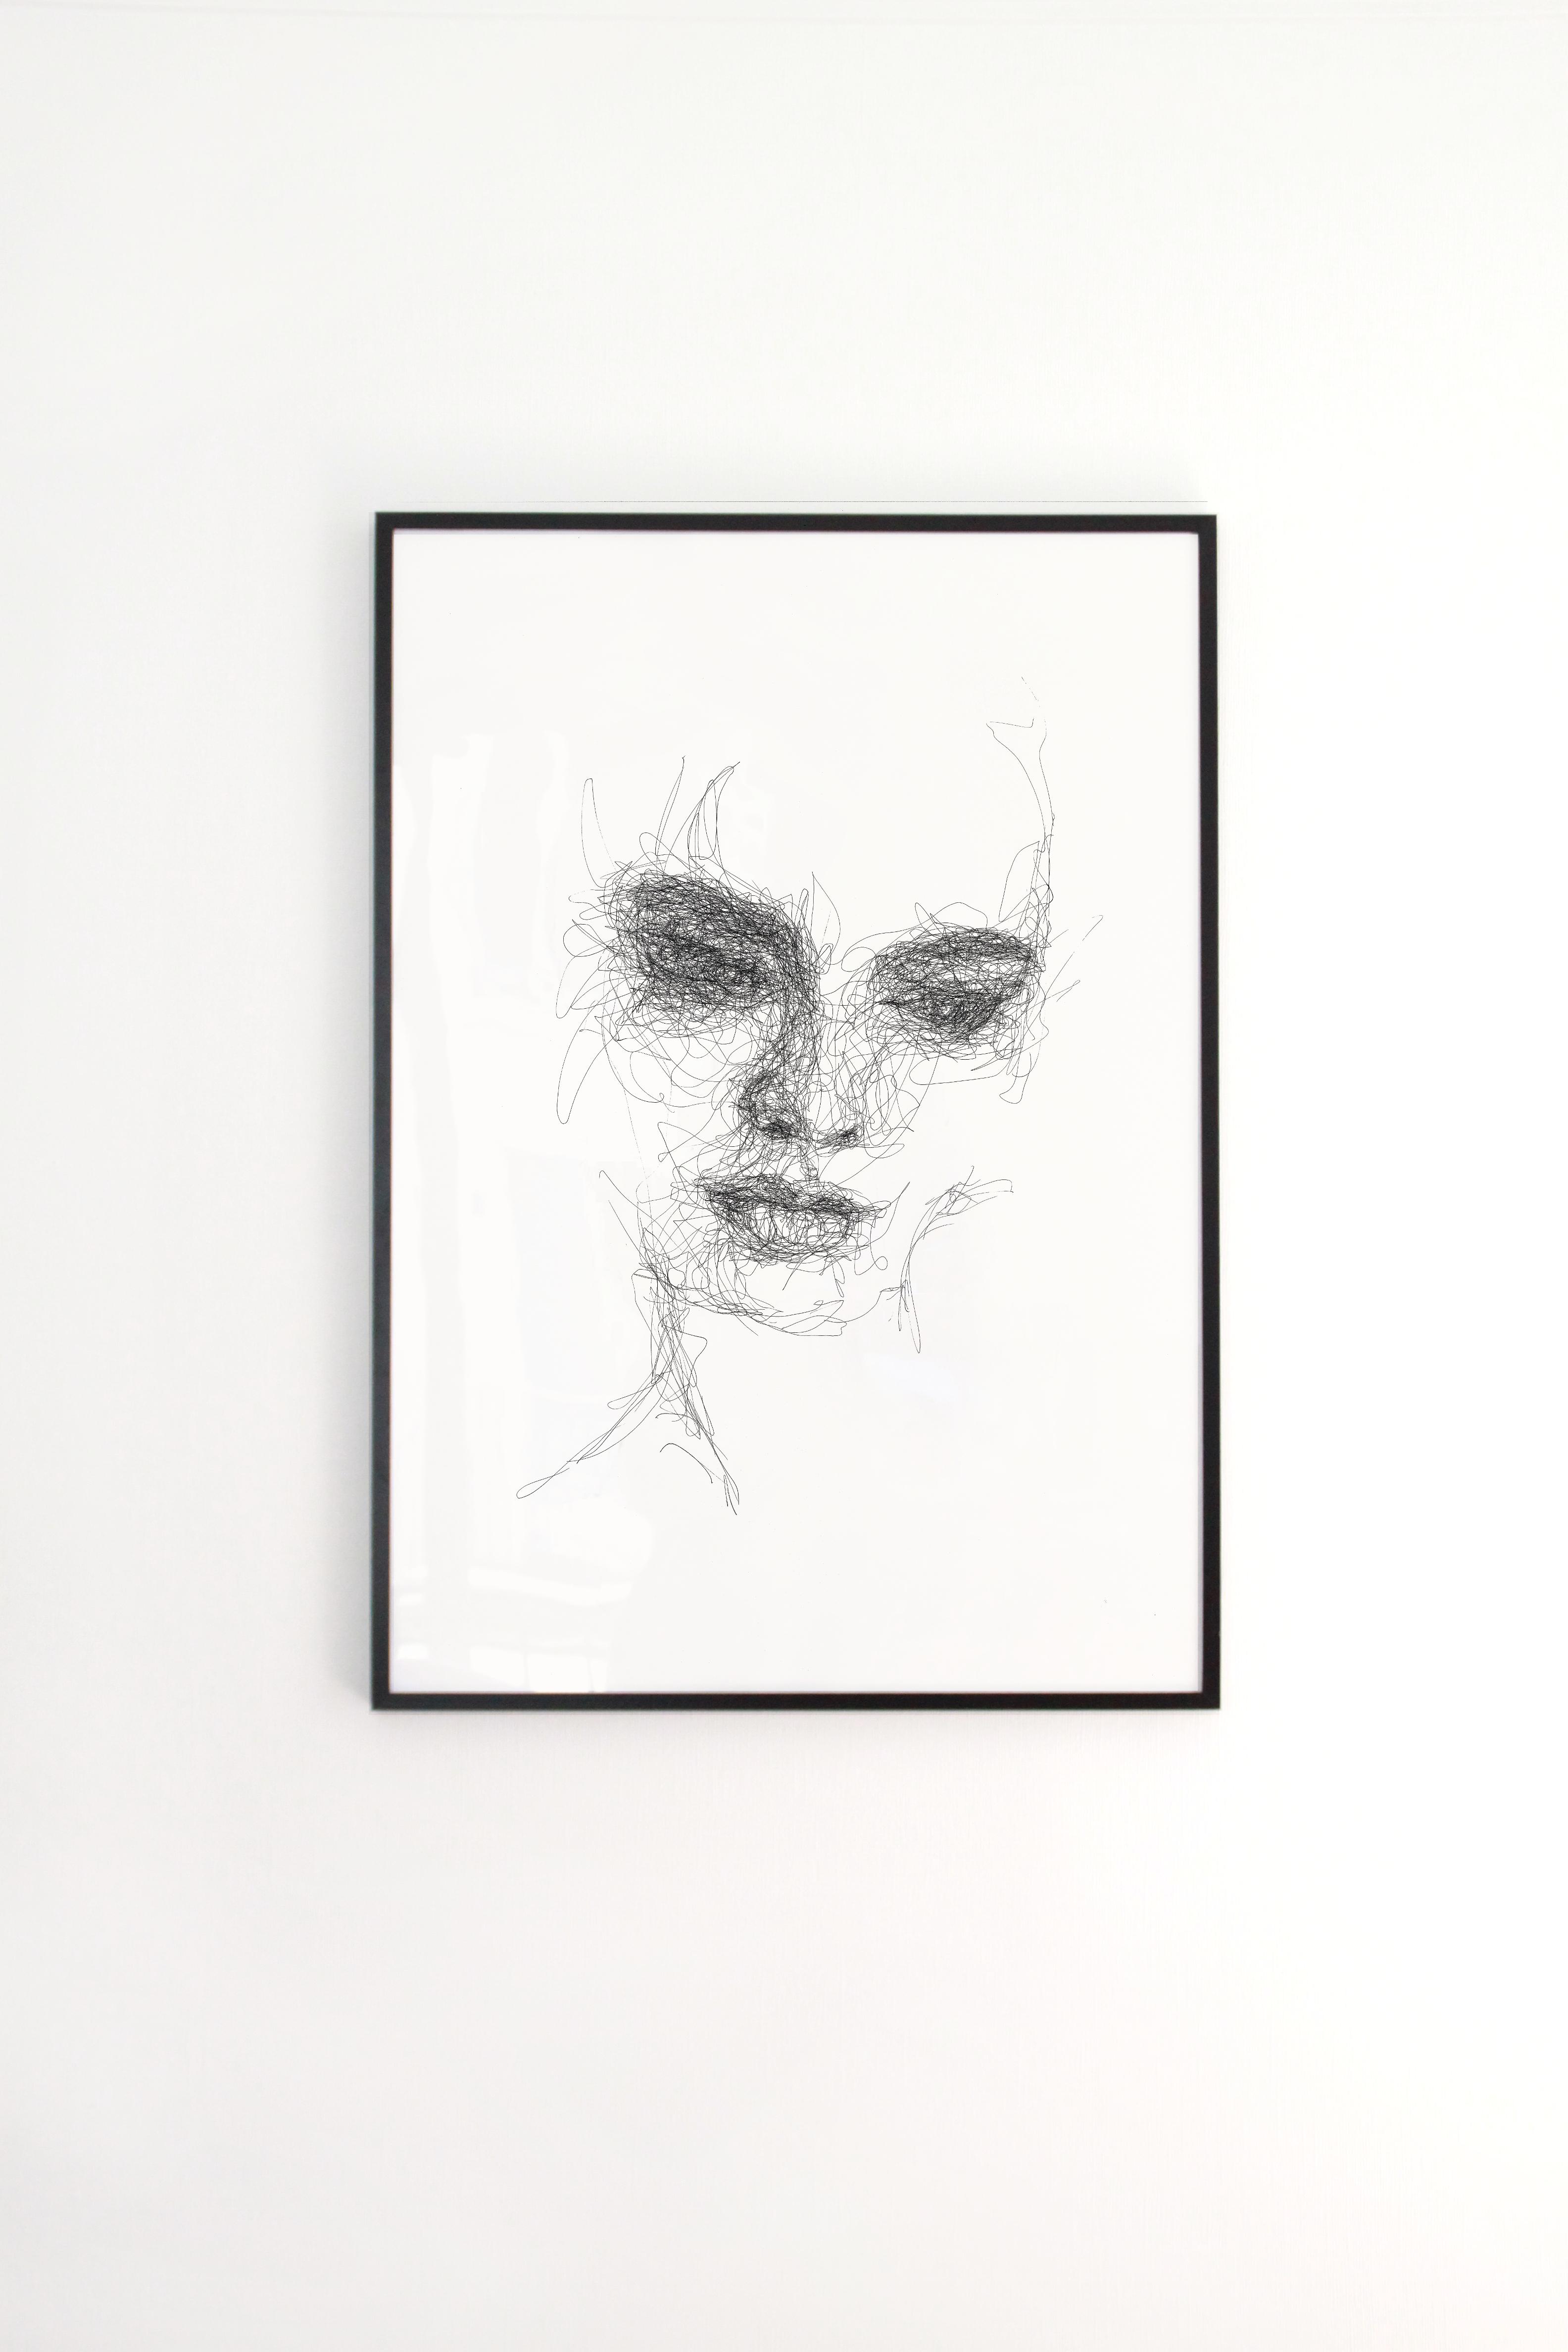 Scribble Face #21